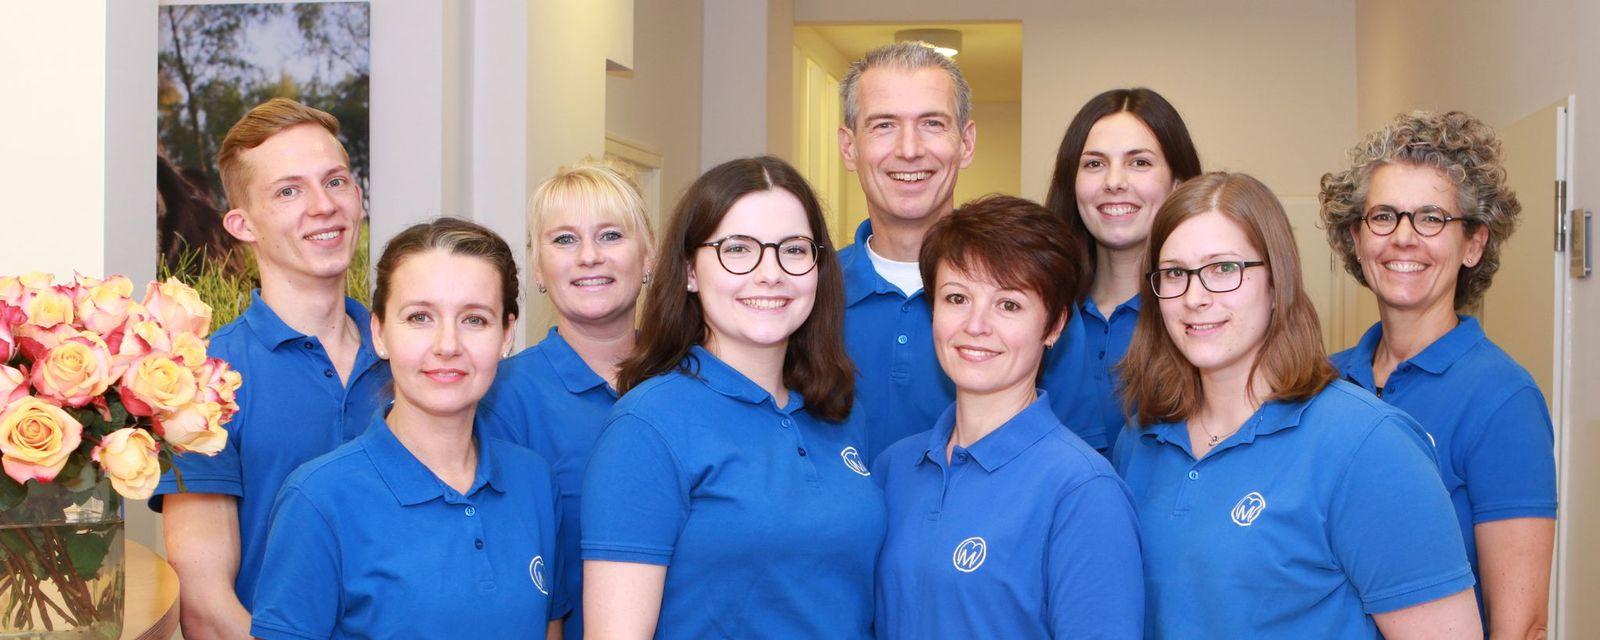 Zahnarzt Dr. Mundorf Team 2020